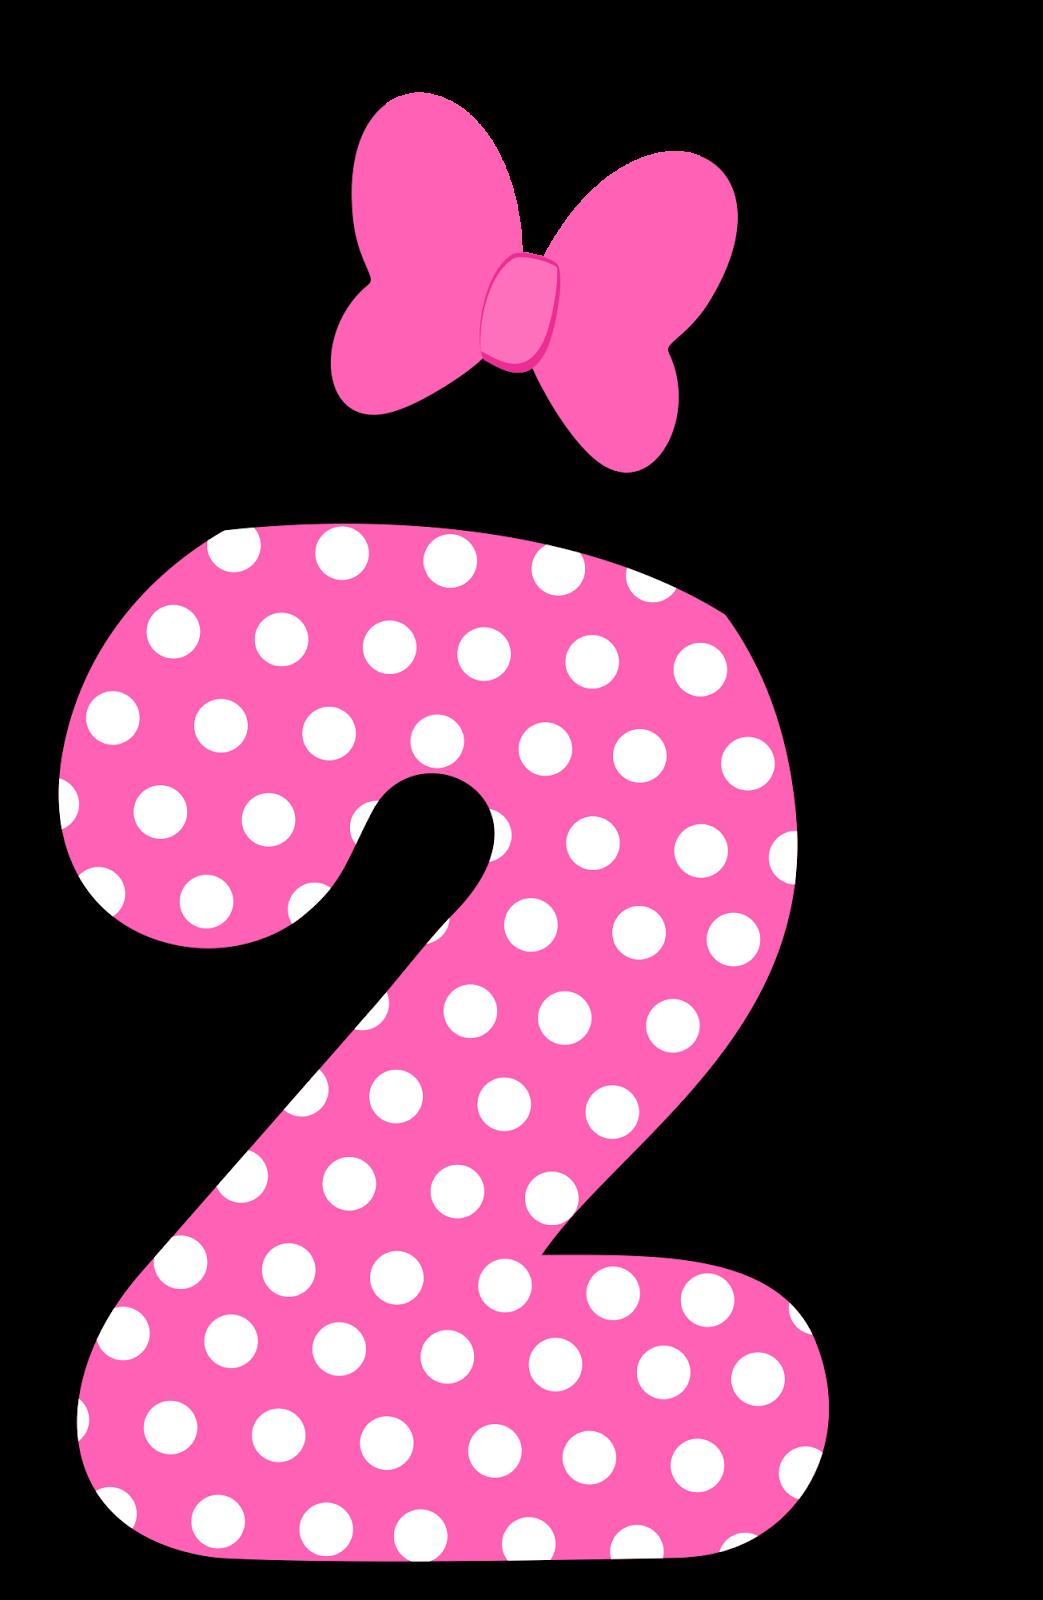 N meros a lo. Number 2 clipart 2nd birthday boy